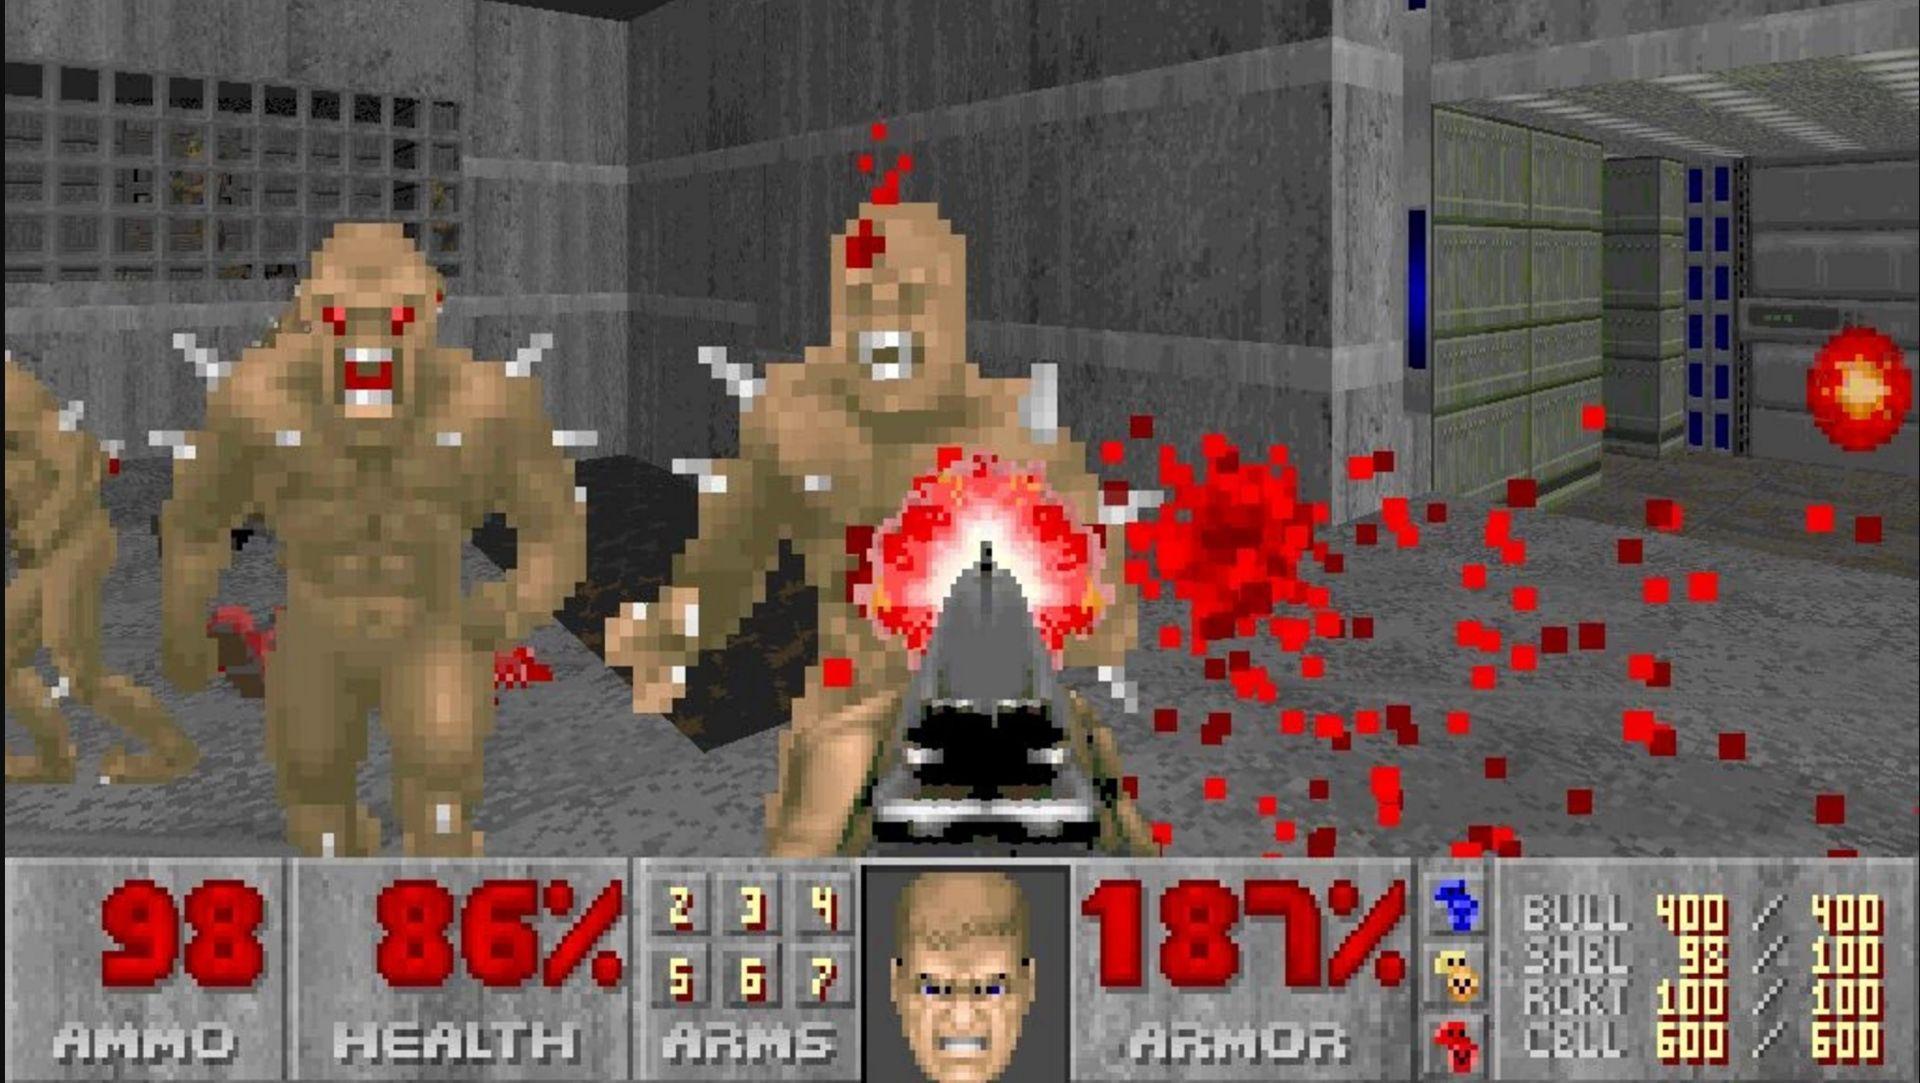 https://gamingbolt.com/wp-content/uploads/2019/07/Doom.jpg